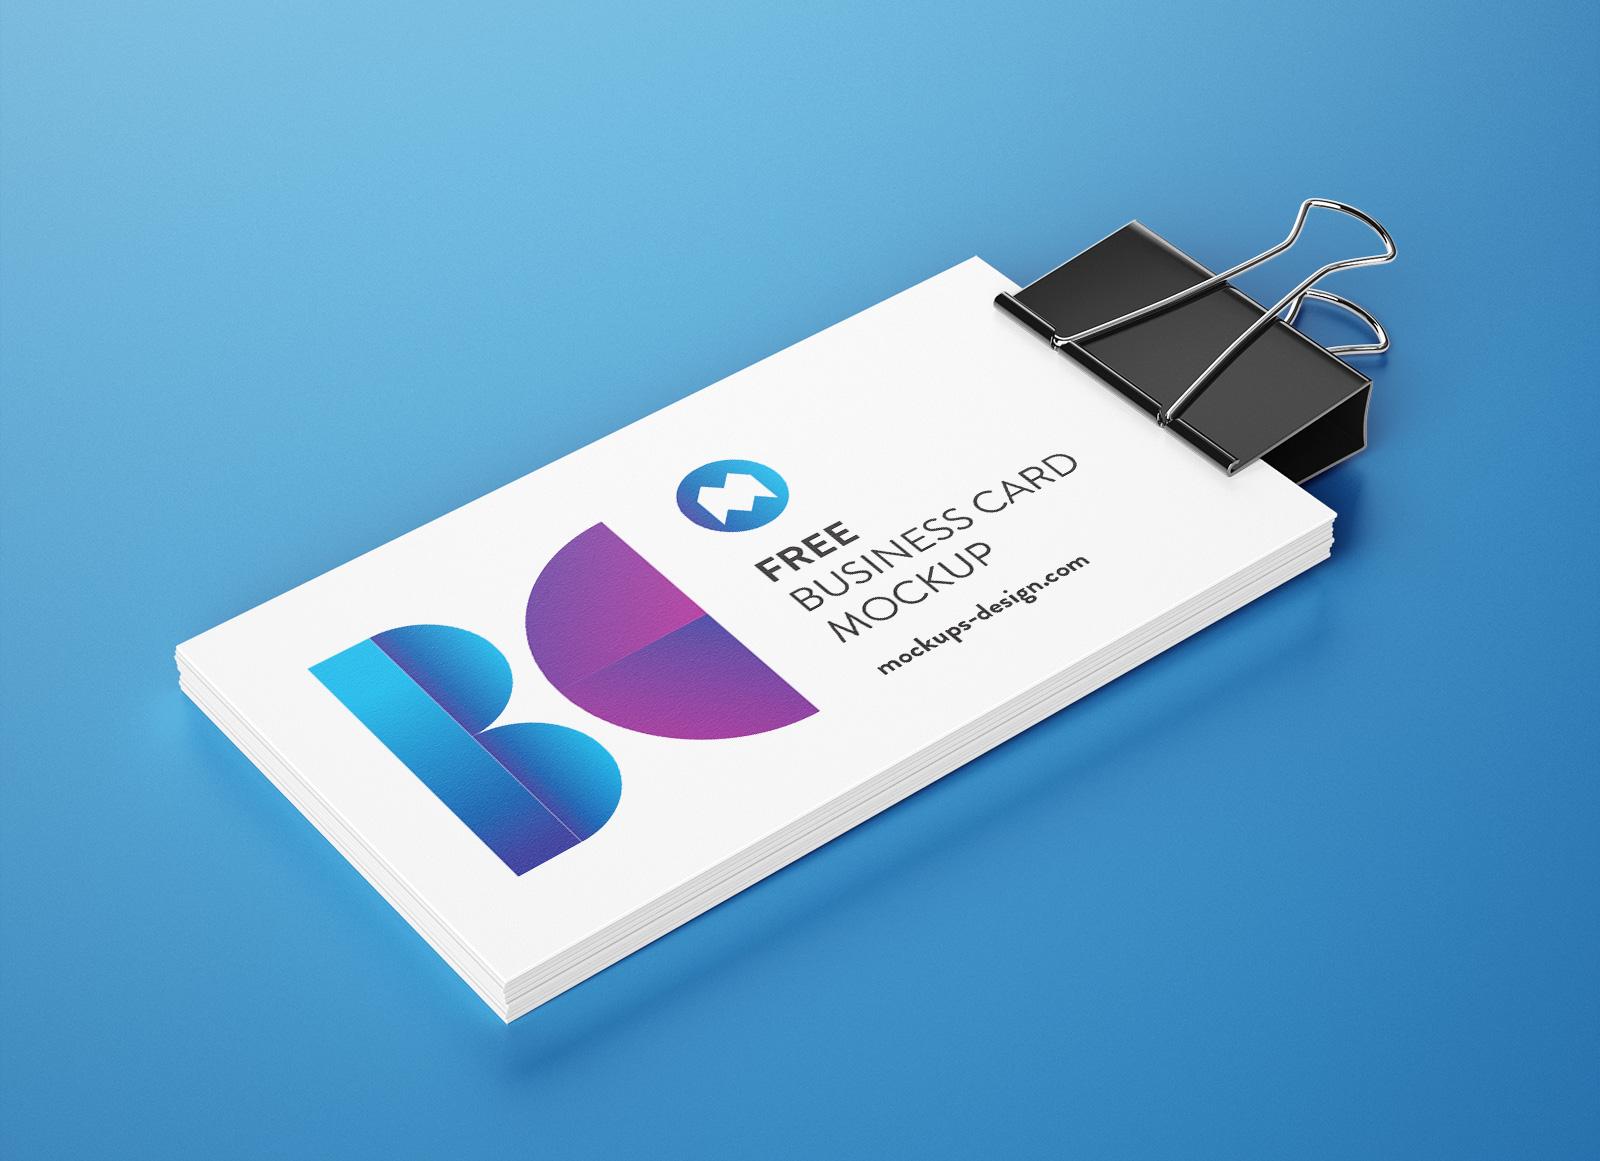 Free-Binder-Clip-Business-Card-Mockup-PSD-Set